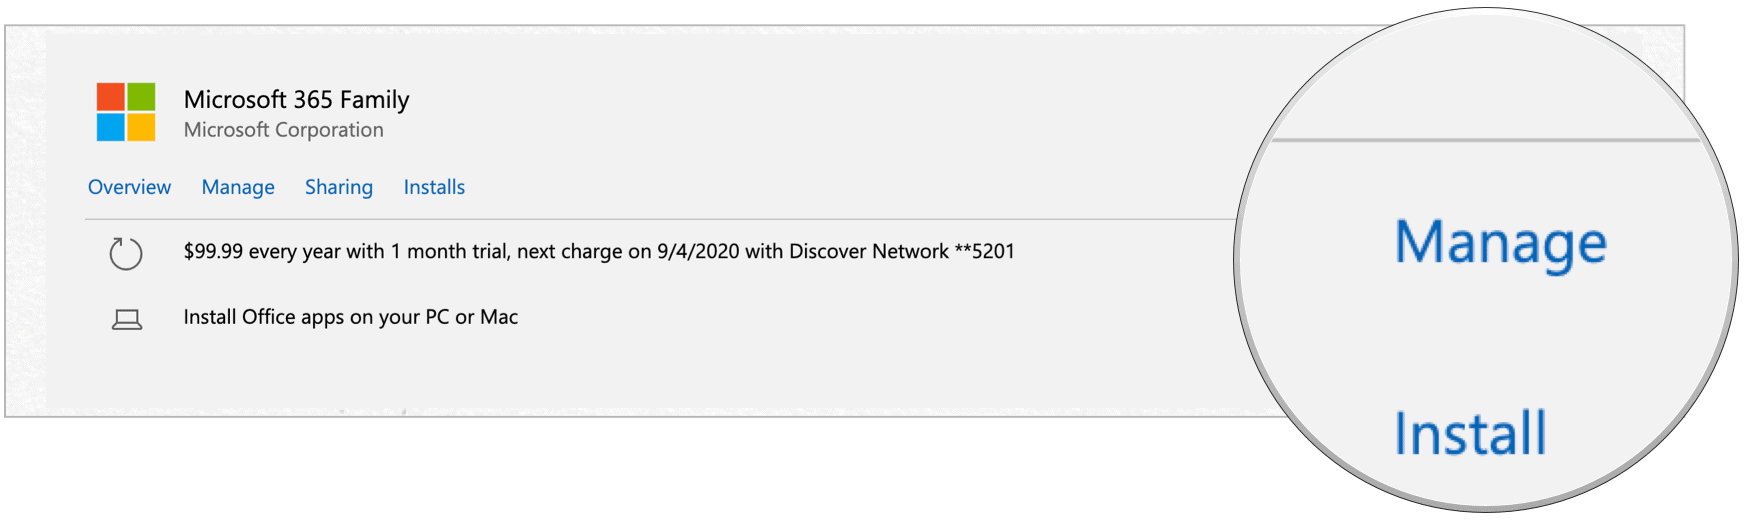 Microsoft 365 cancel manage